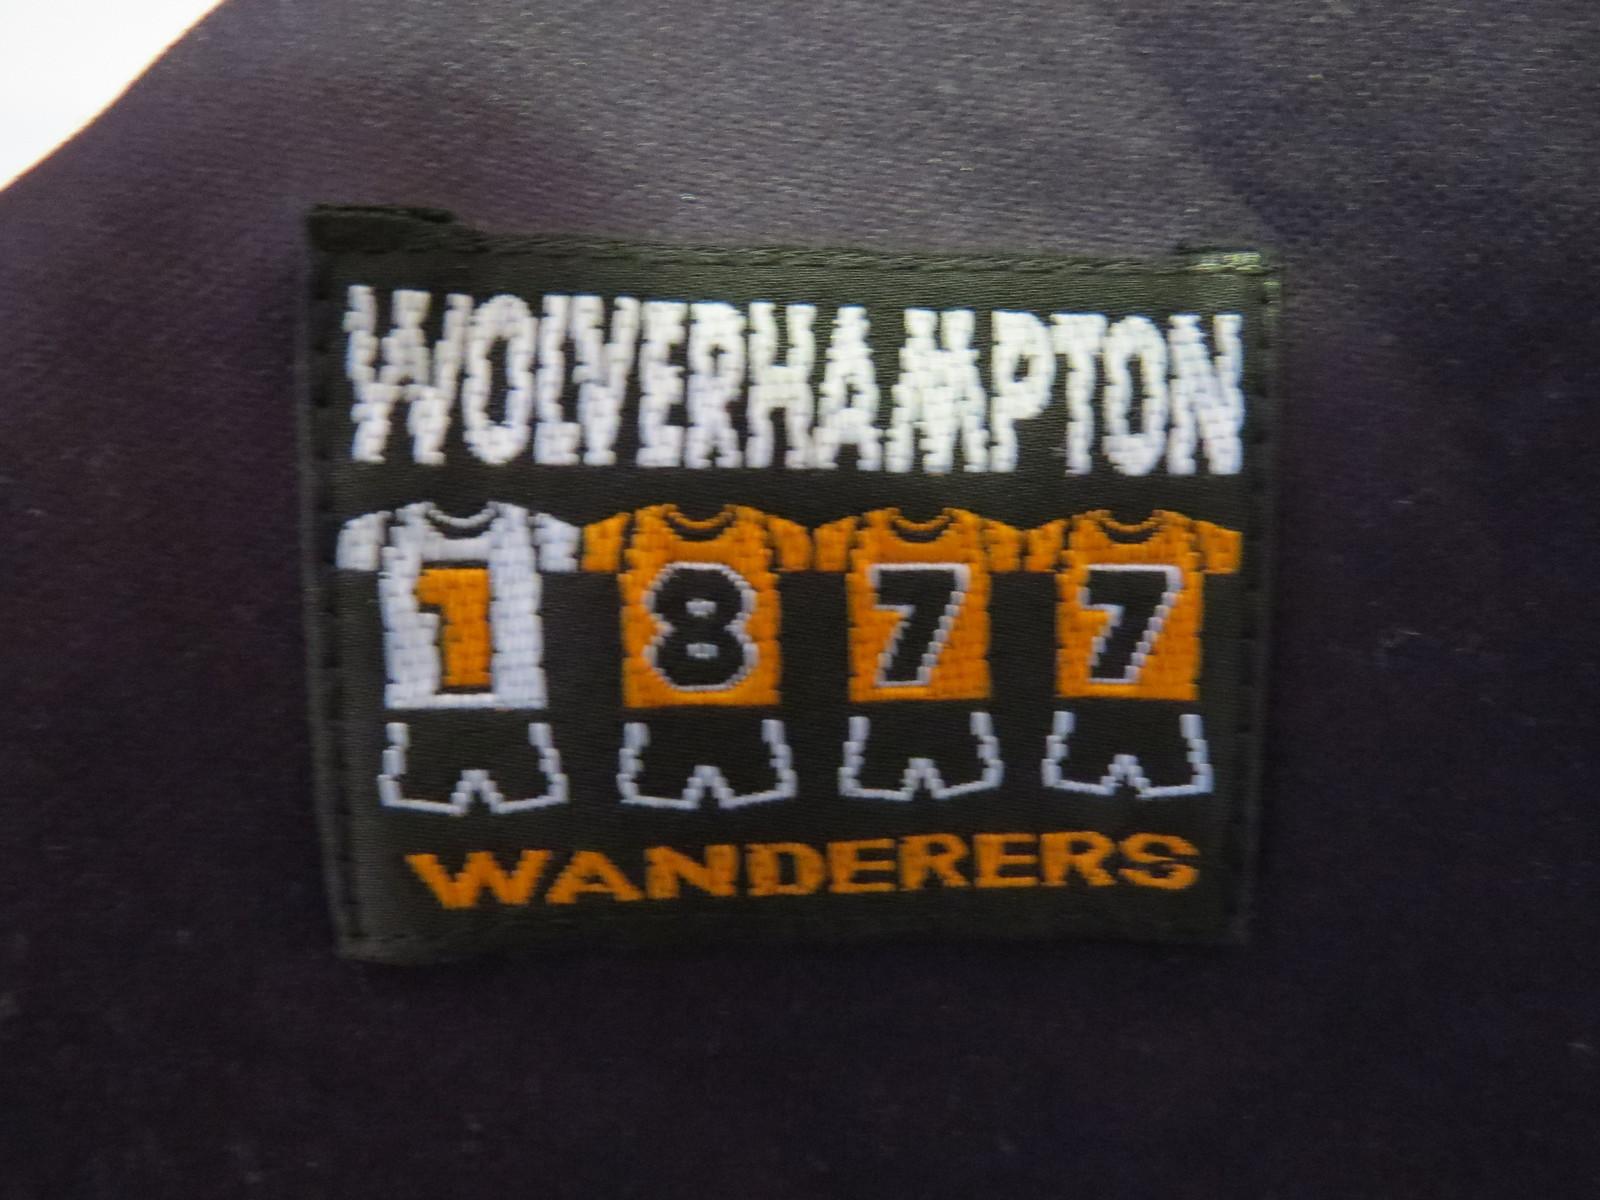 Wolverhampton Home Jersey  (1996-1998) - Amazing Background Print - Men's Medium